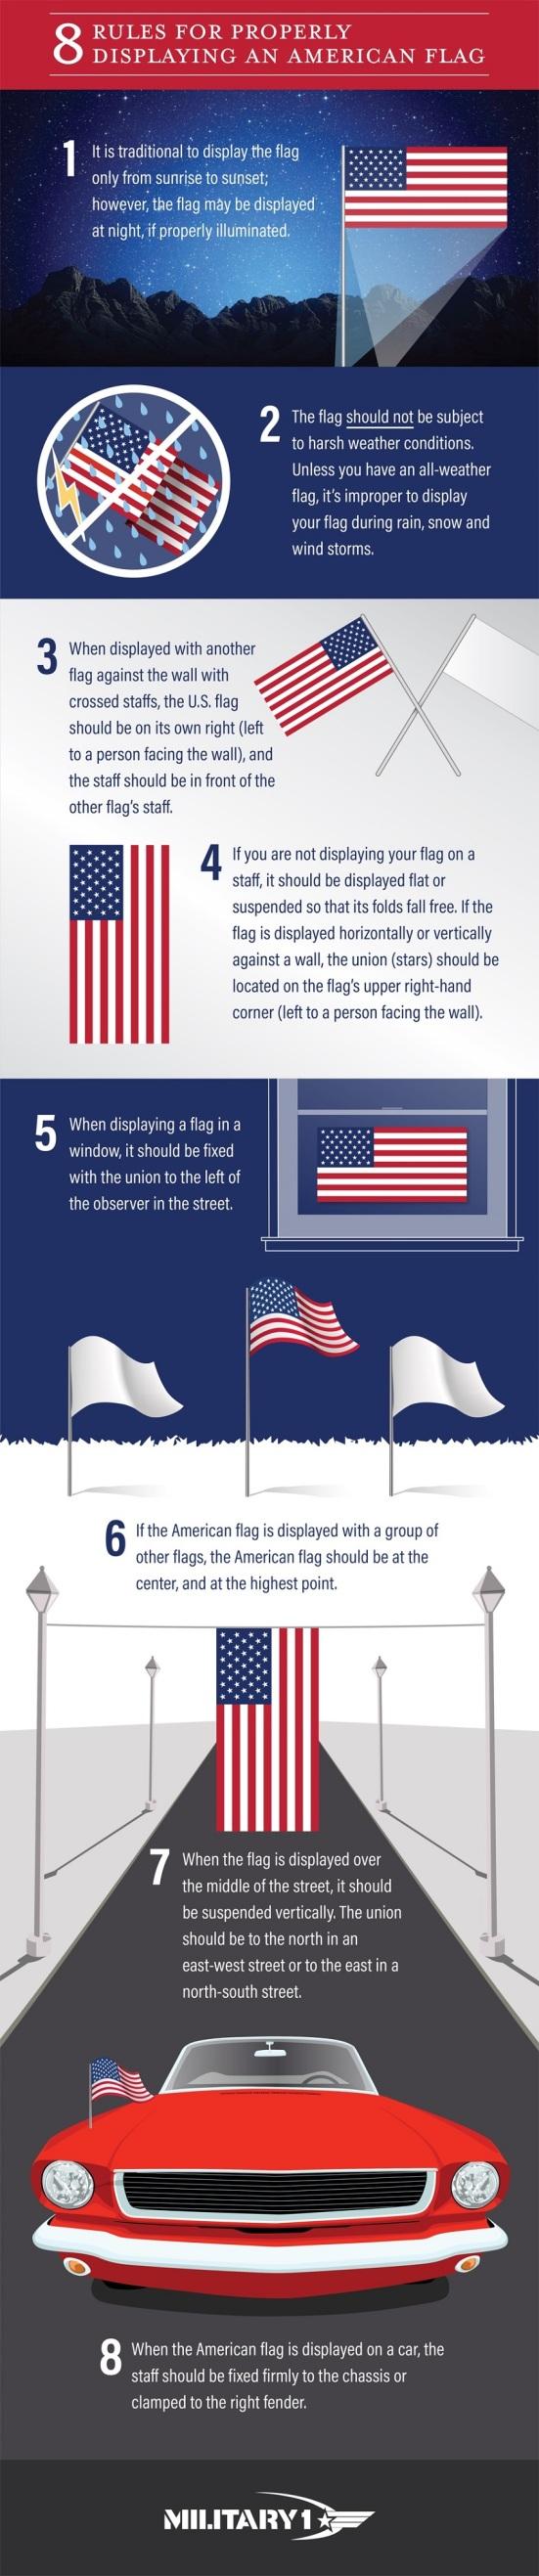 Military-Flag-1-1